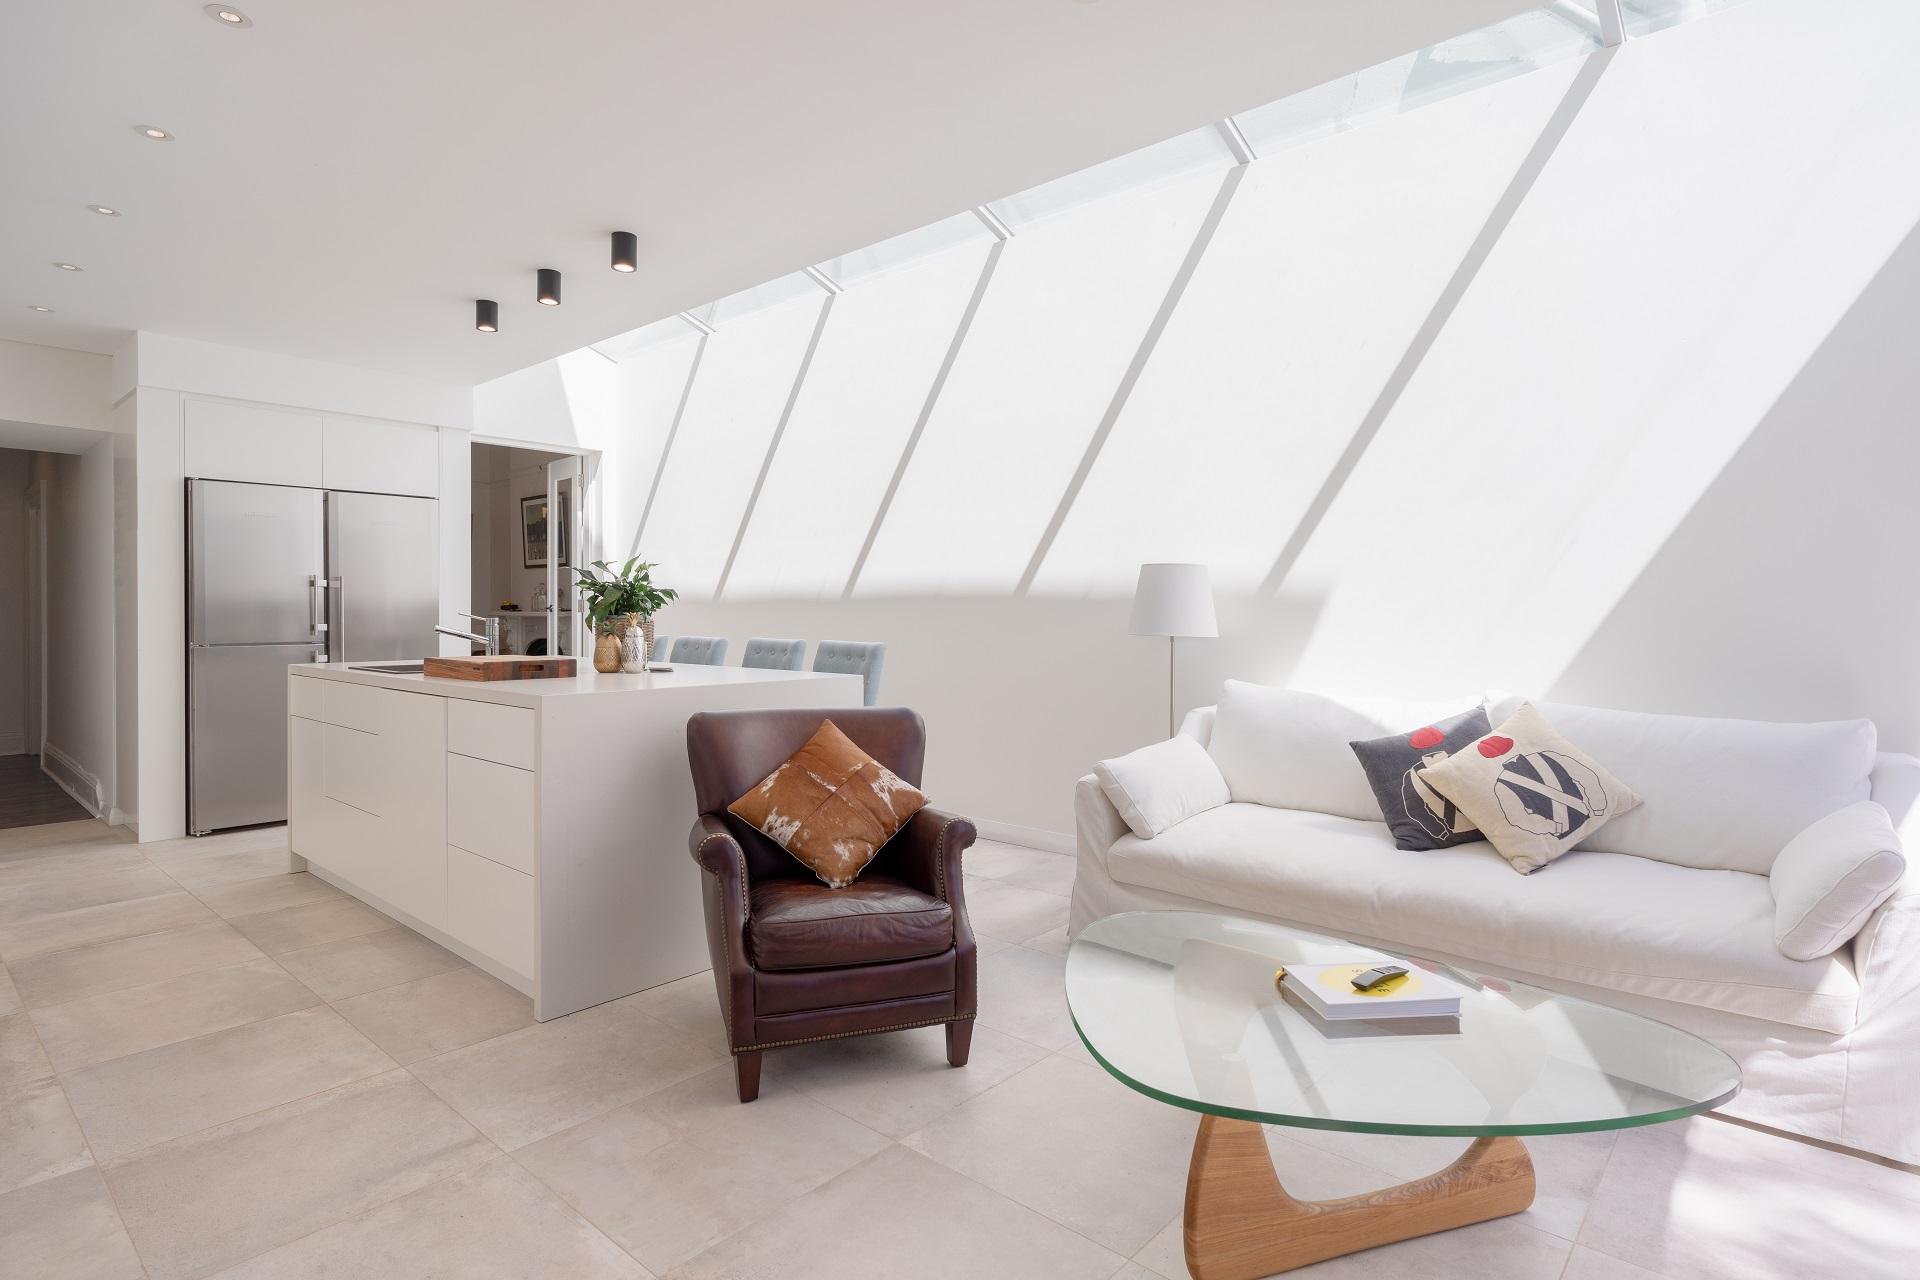 1_CTI-Kitchens-Manly-renovation